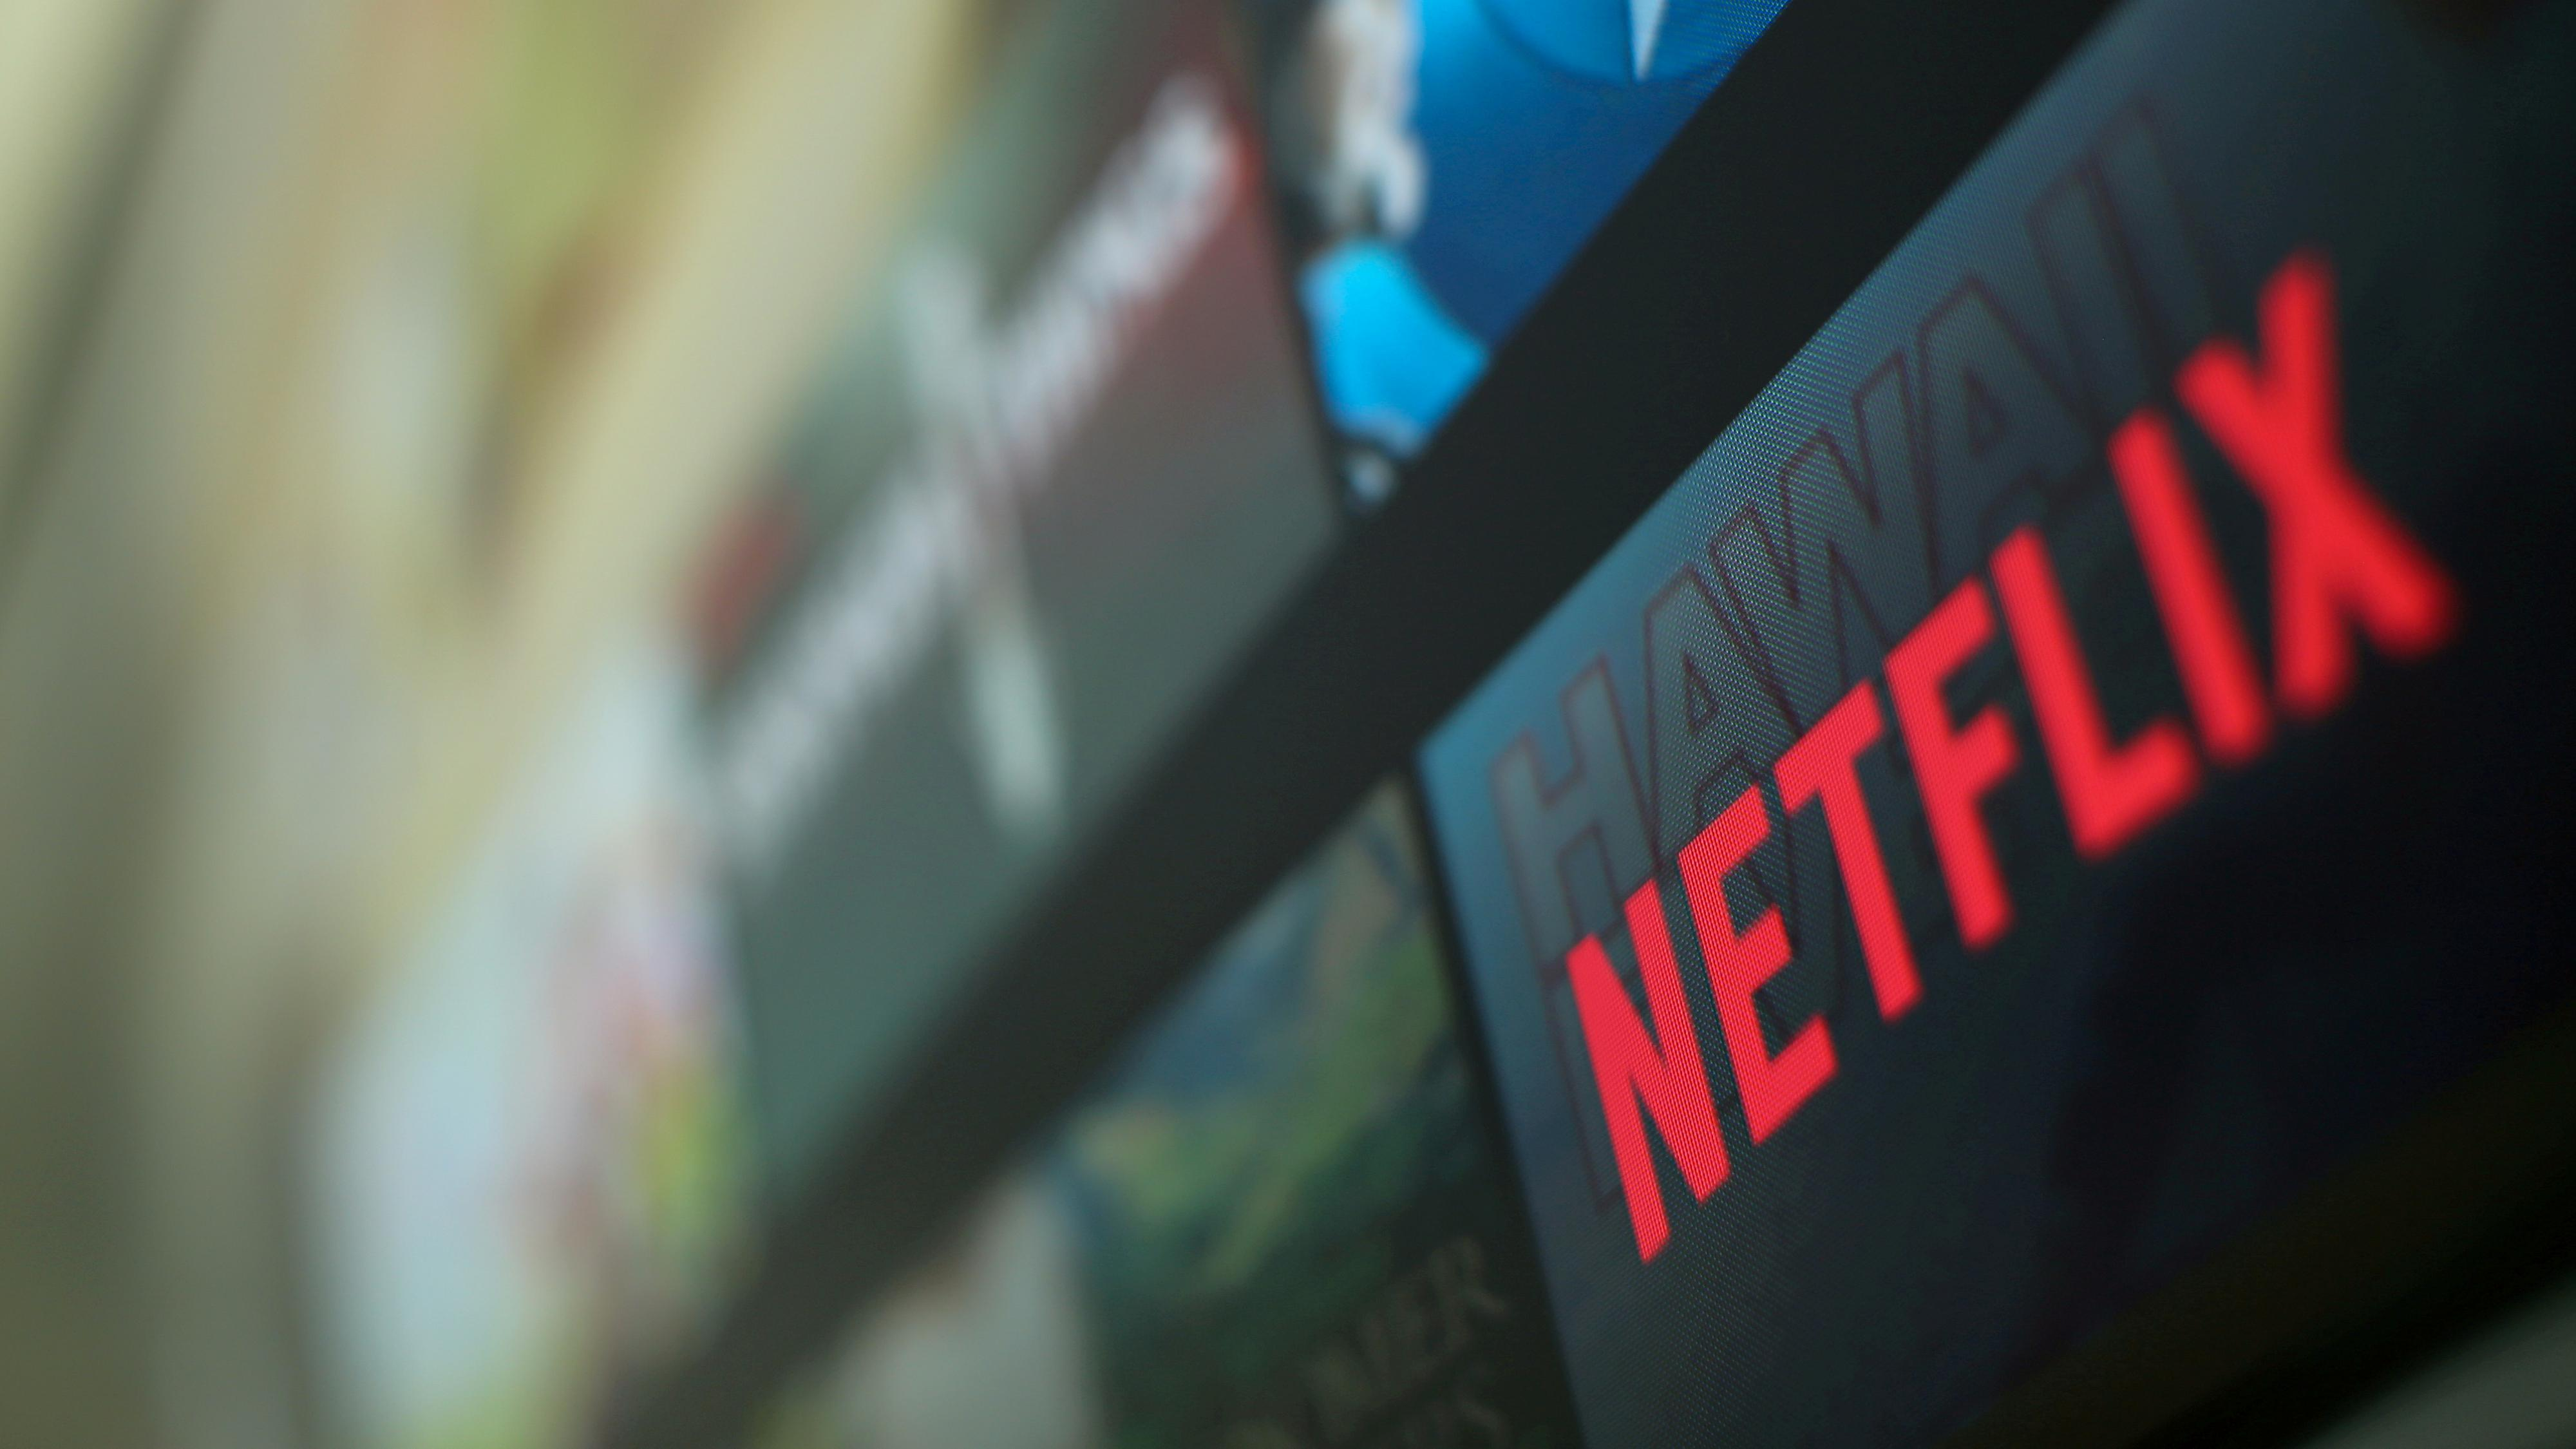 Nå skrur Netflix ned kvaliteten